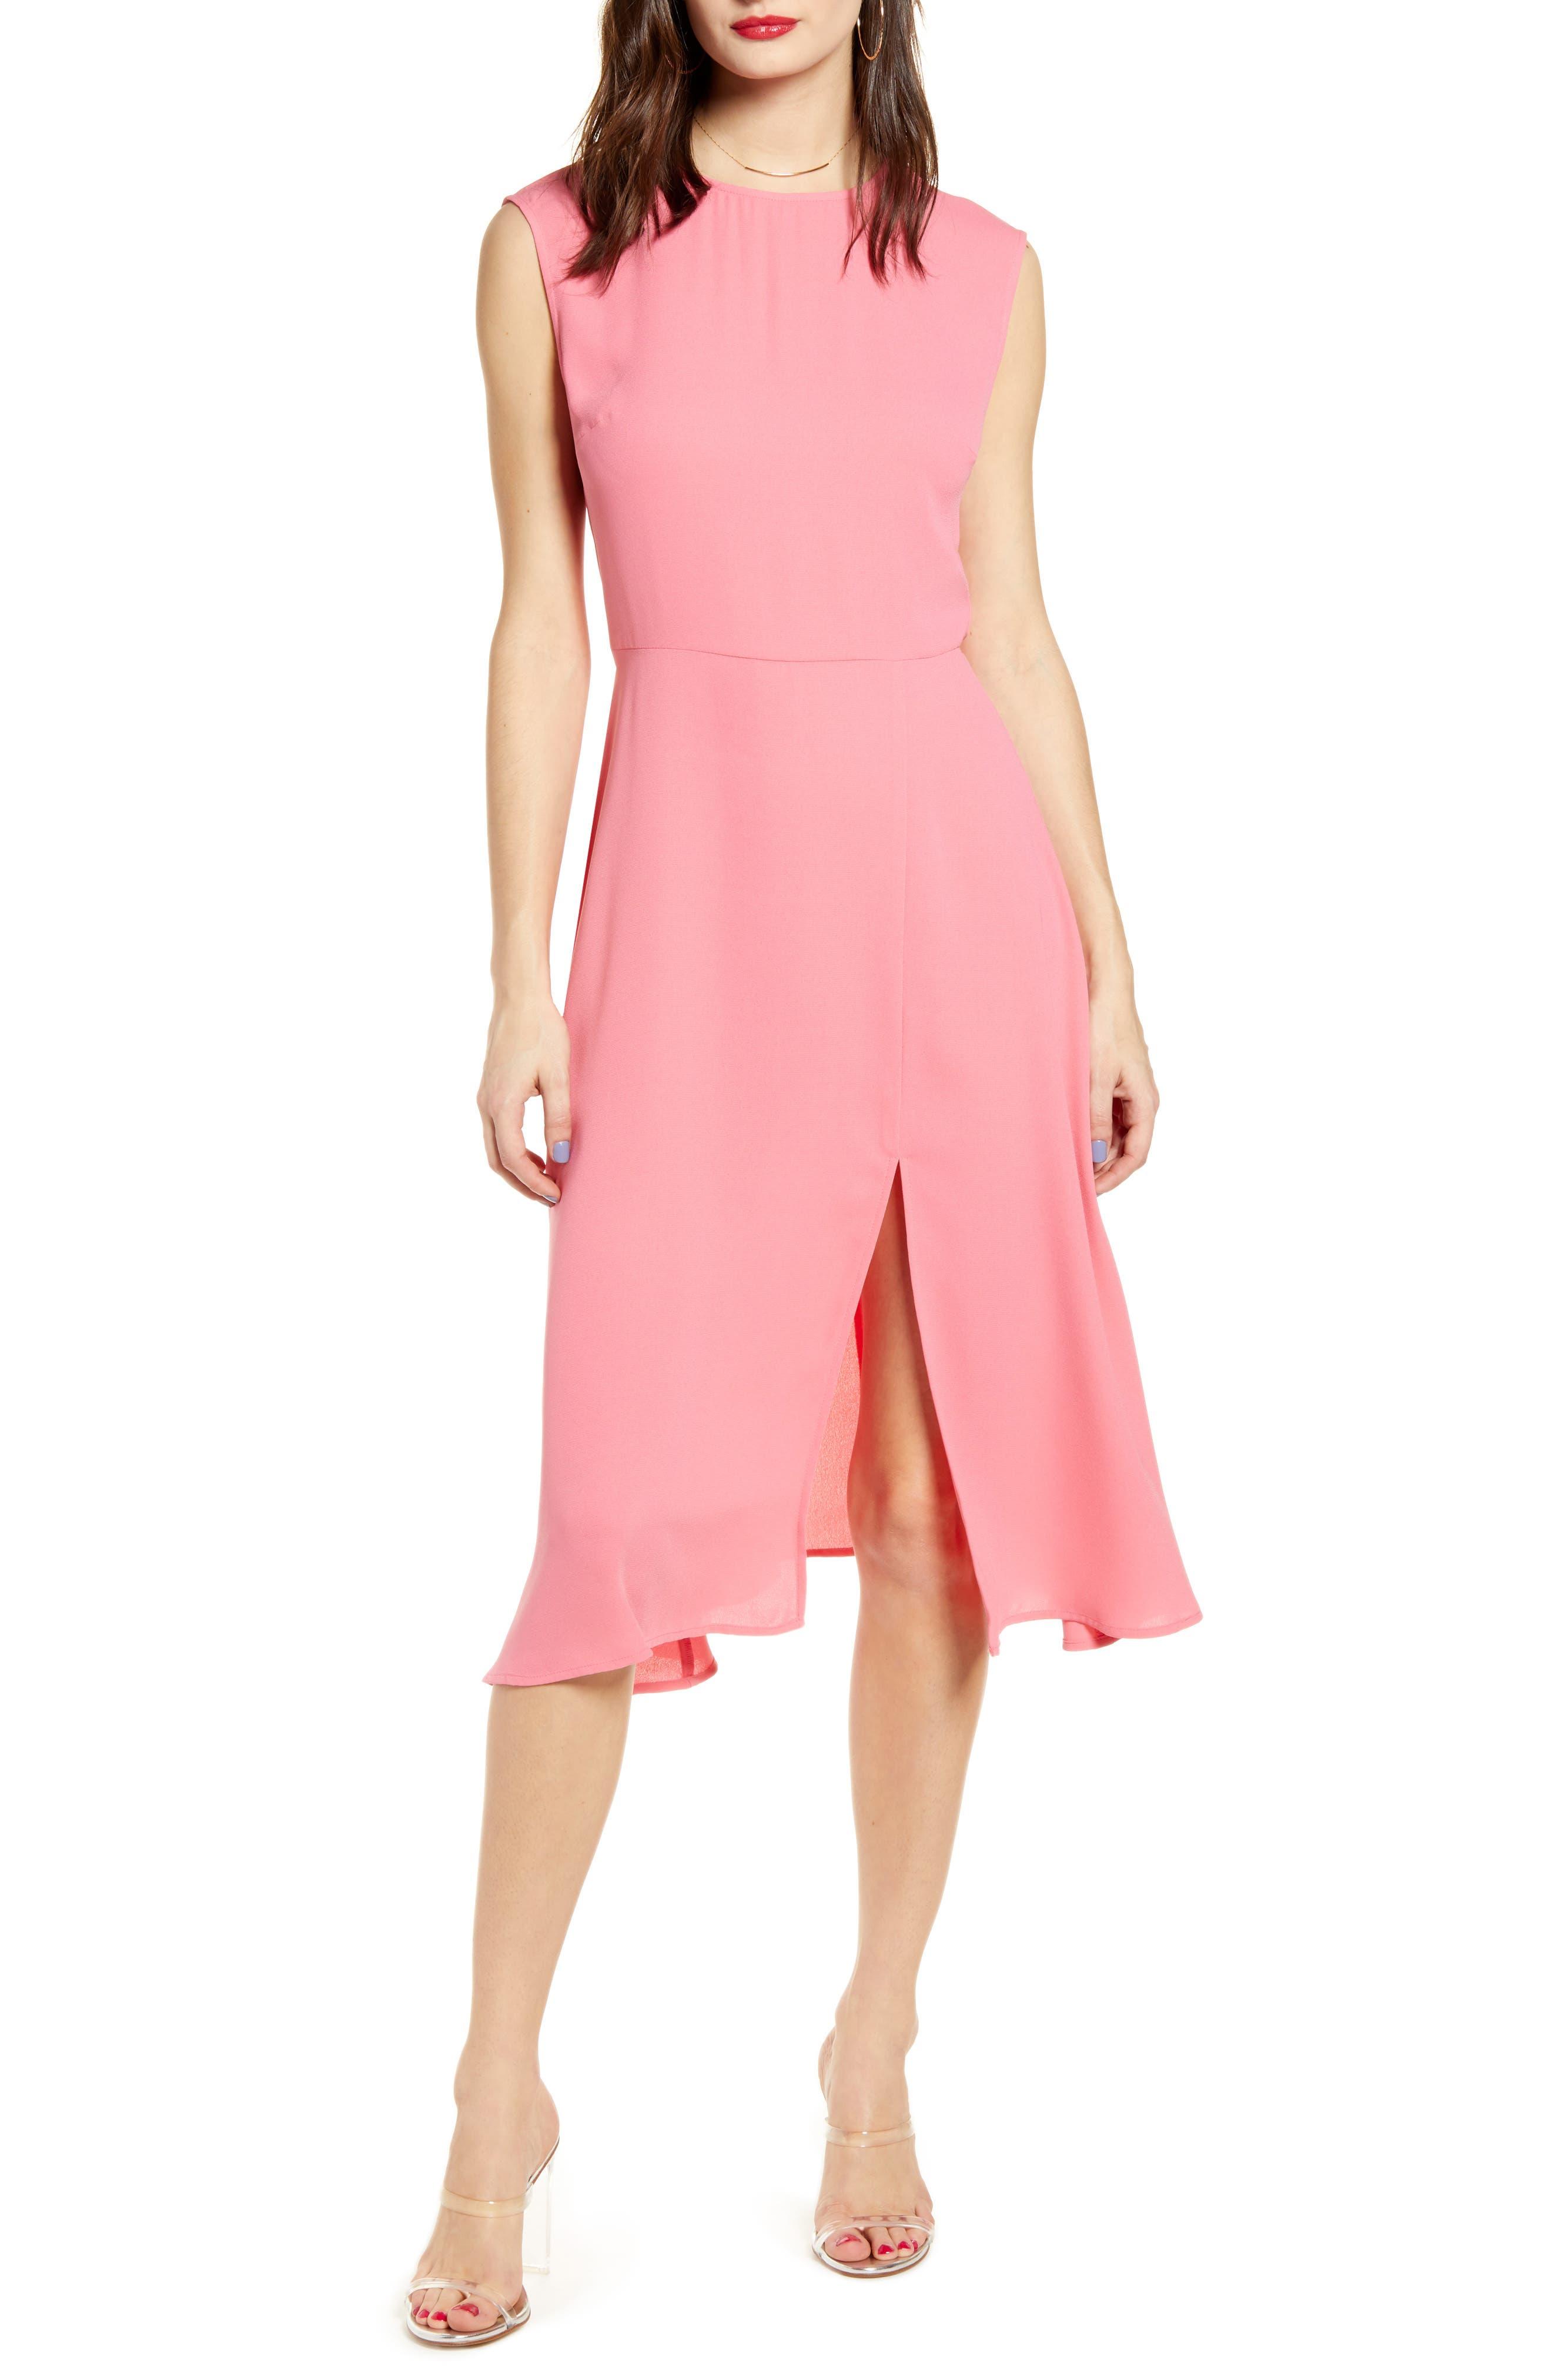 LEITH, Chic Midi Dress, Main thumbnail 1, color, PINK LEMONADE